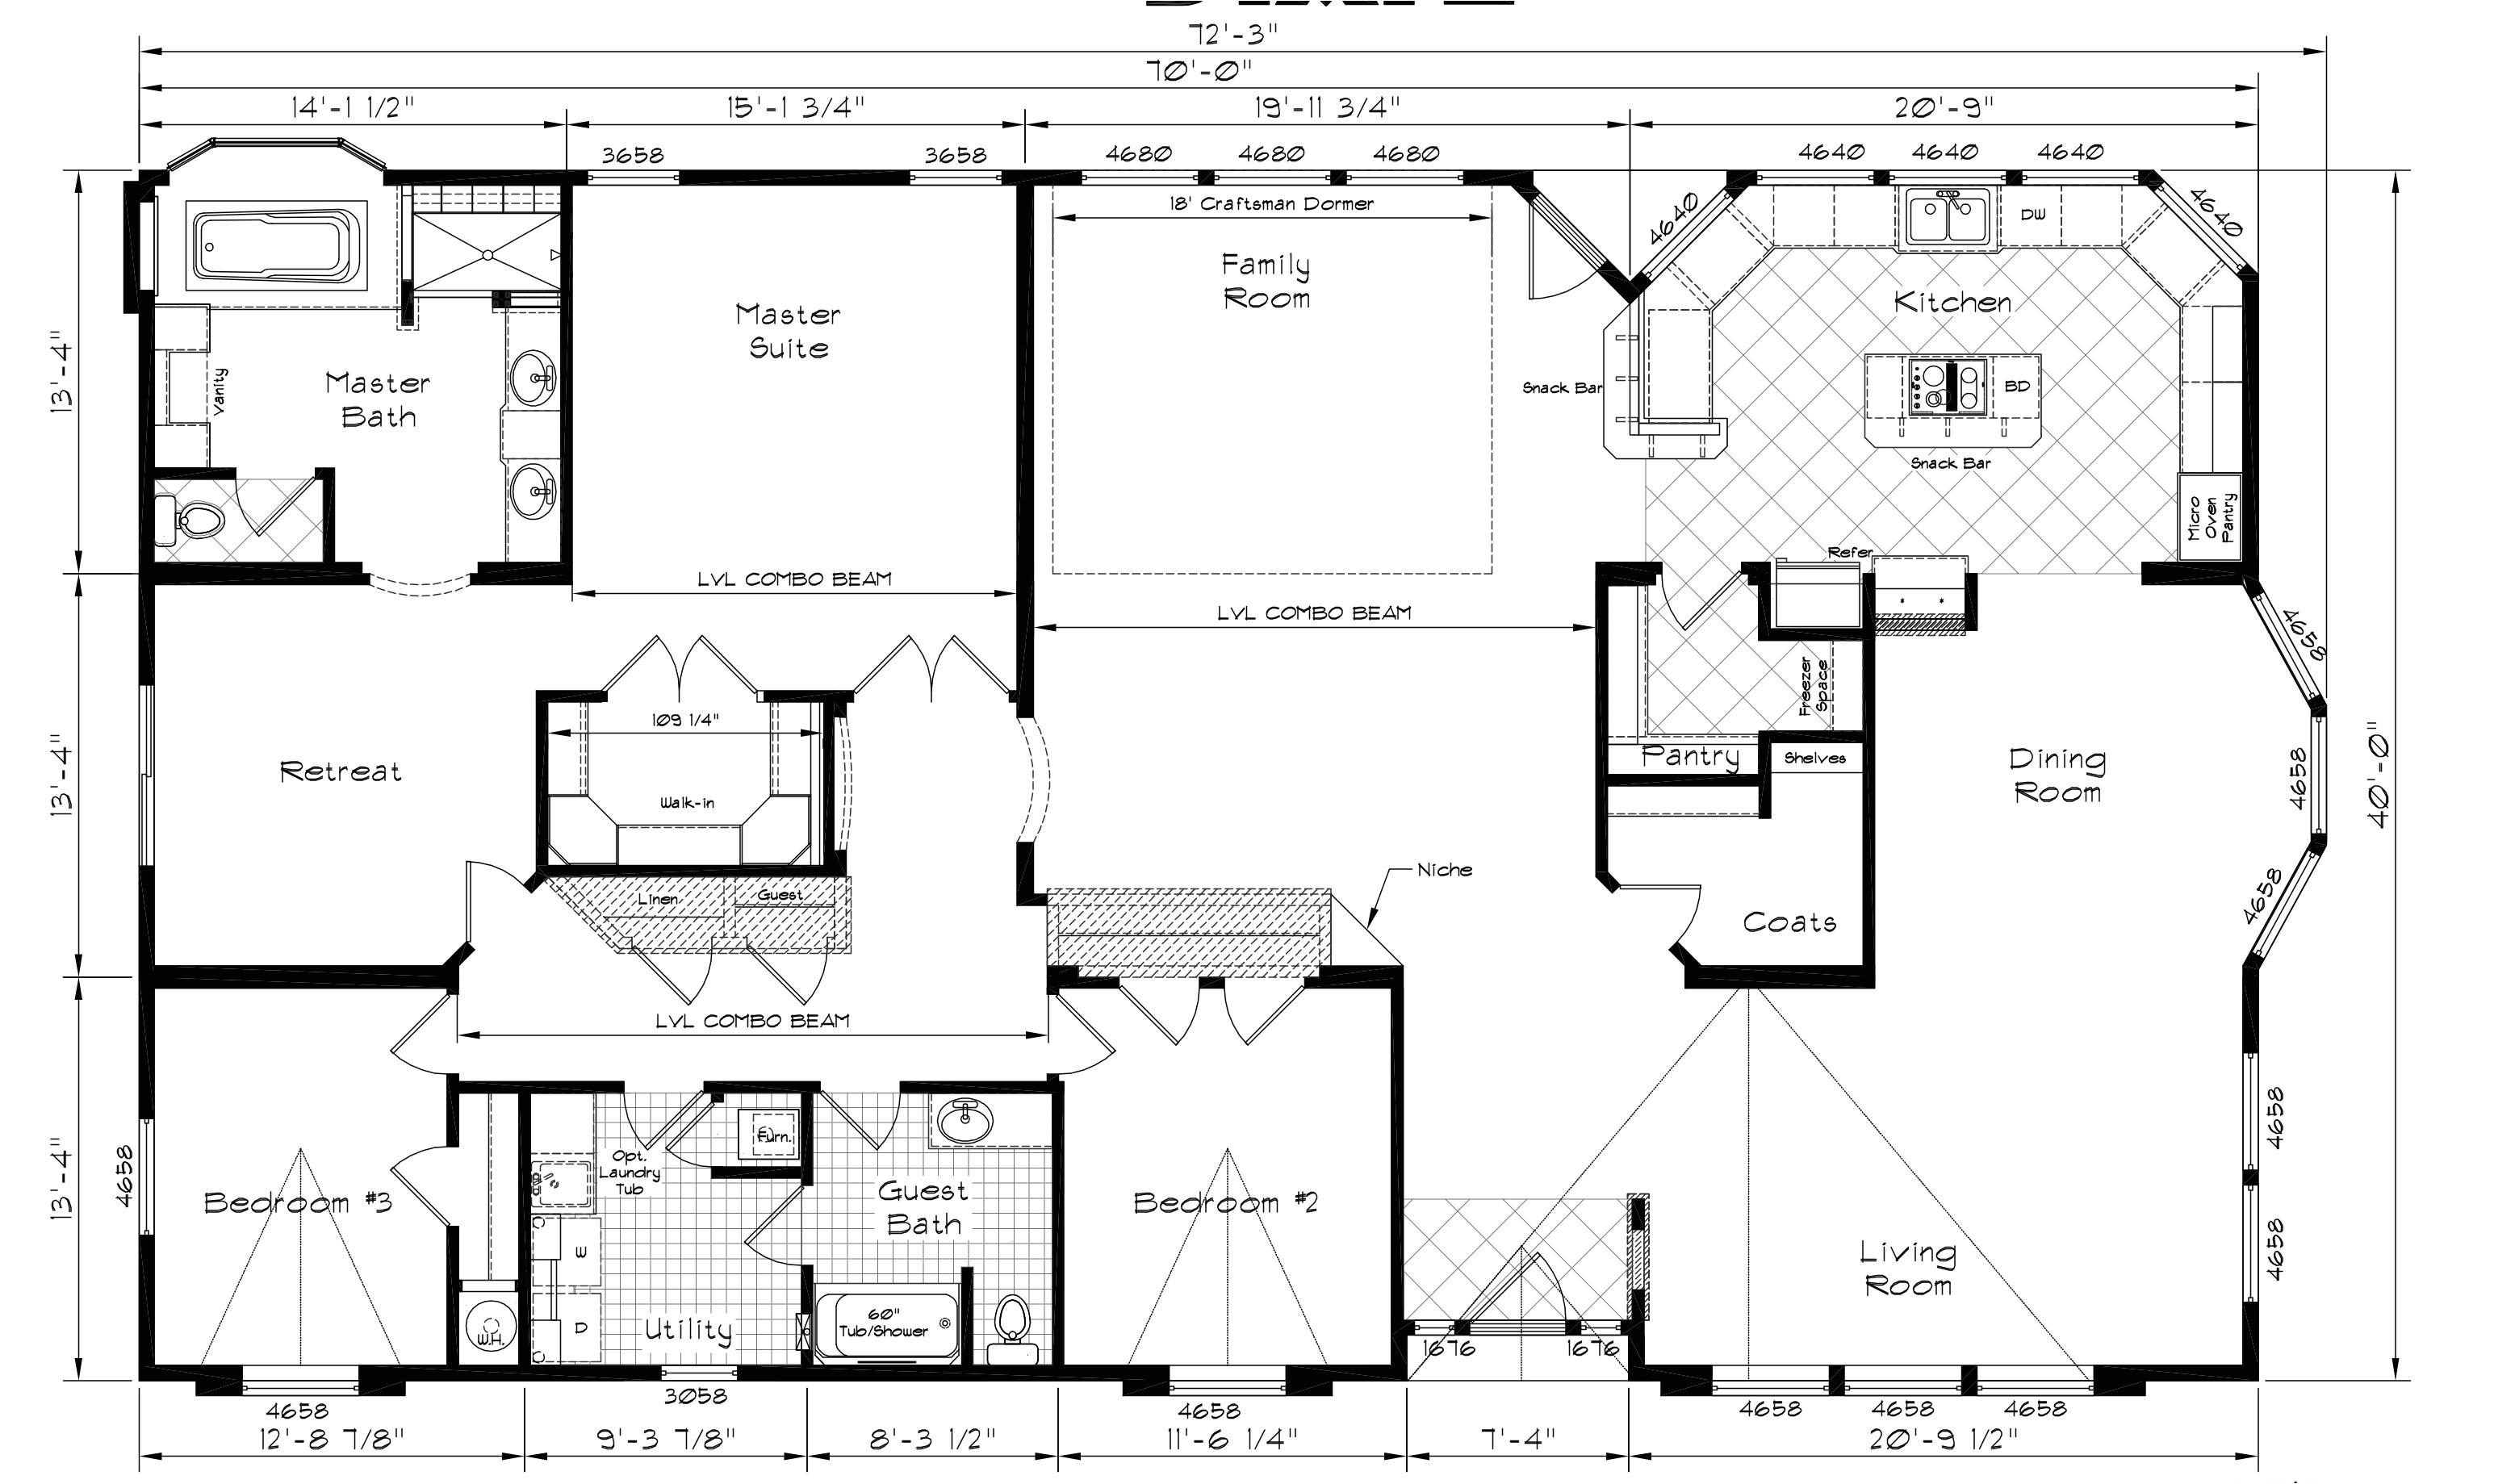 marlette homes floor plans new manufactured homes marlette floor plans home triple wide lock you